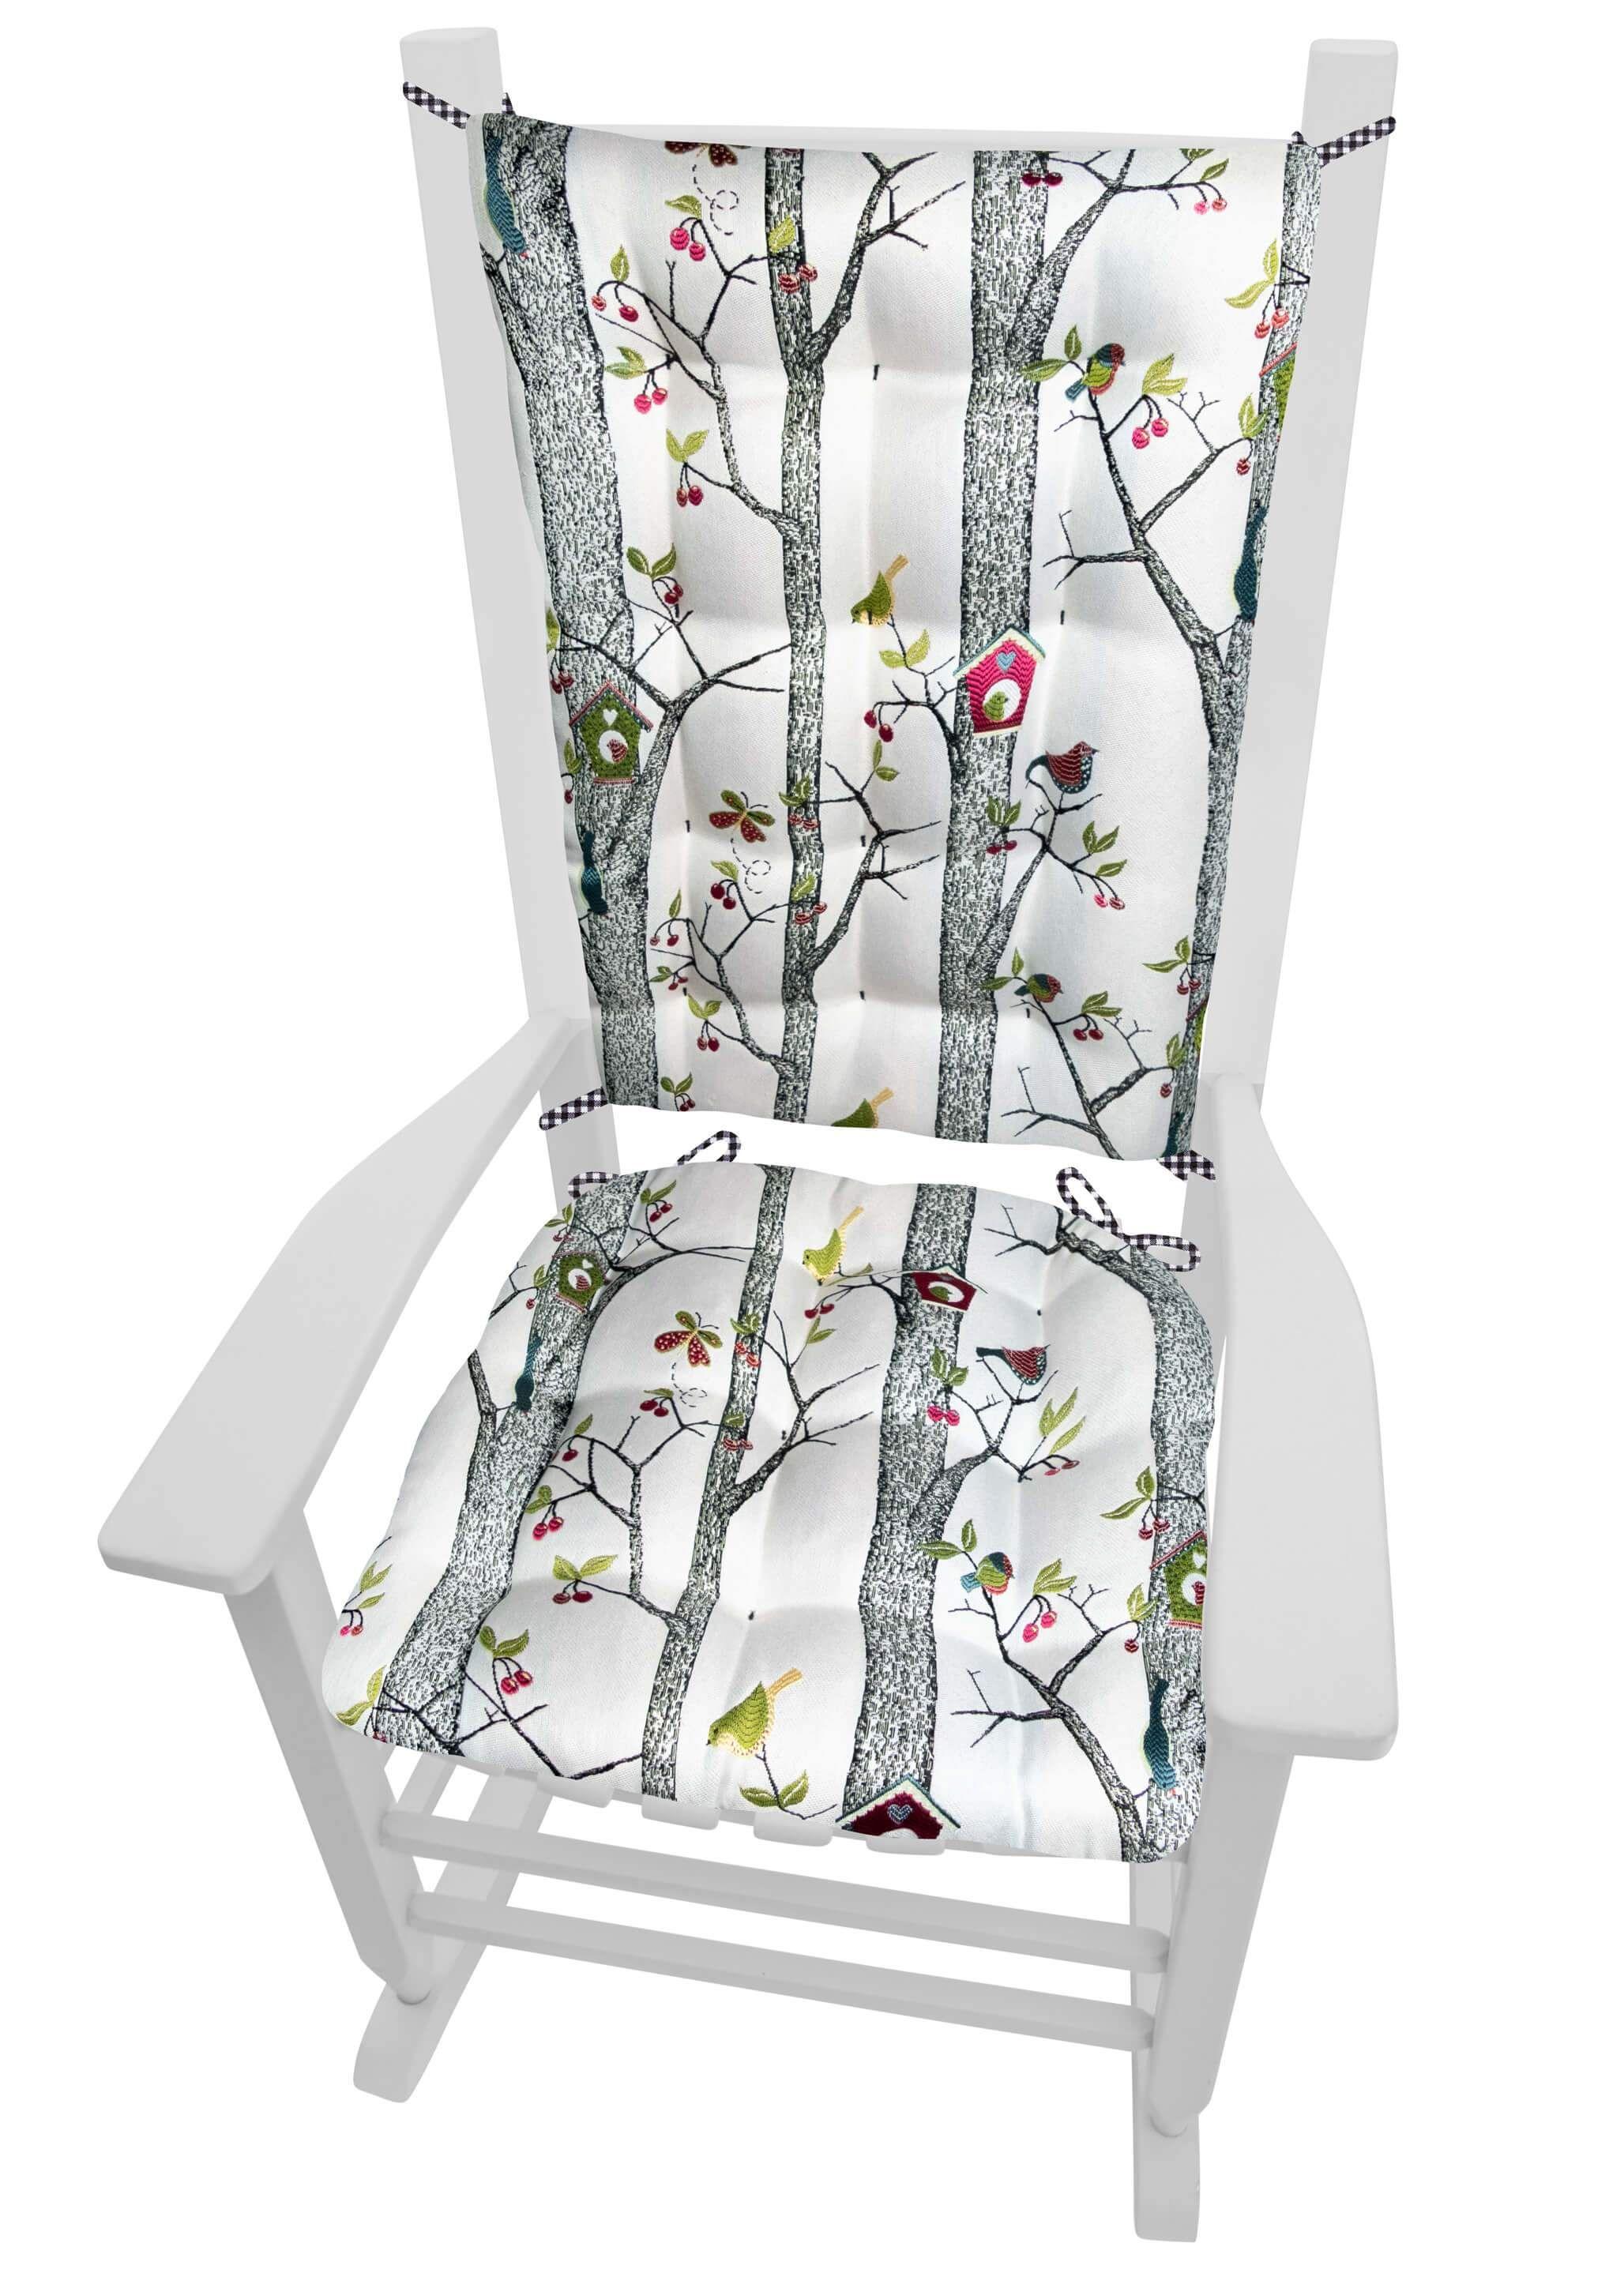 Swell Pin On Rocking Chair Cushions Uwap Interior Chair Design Uwaporg